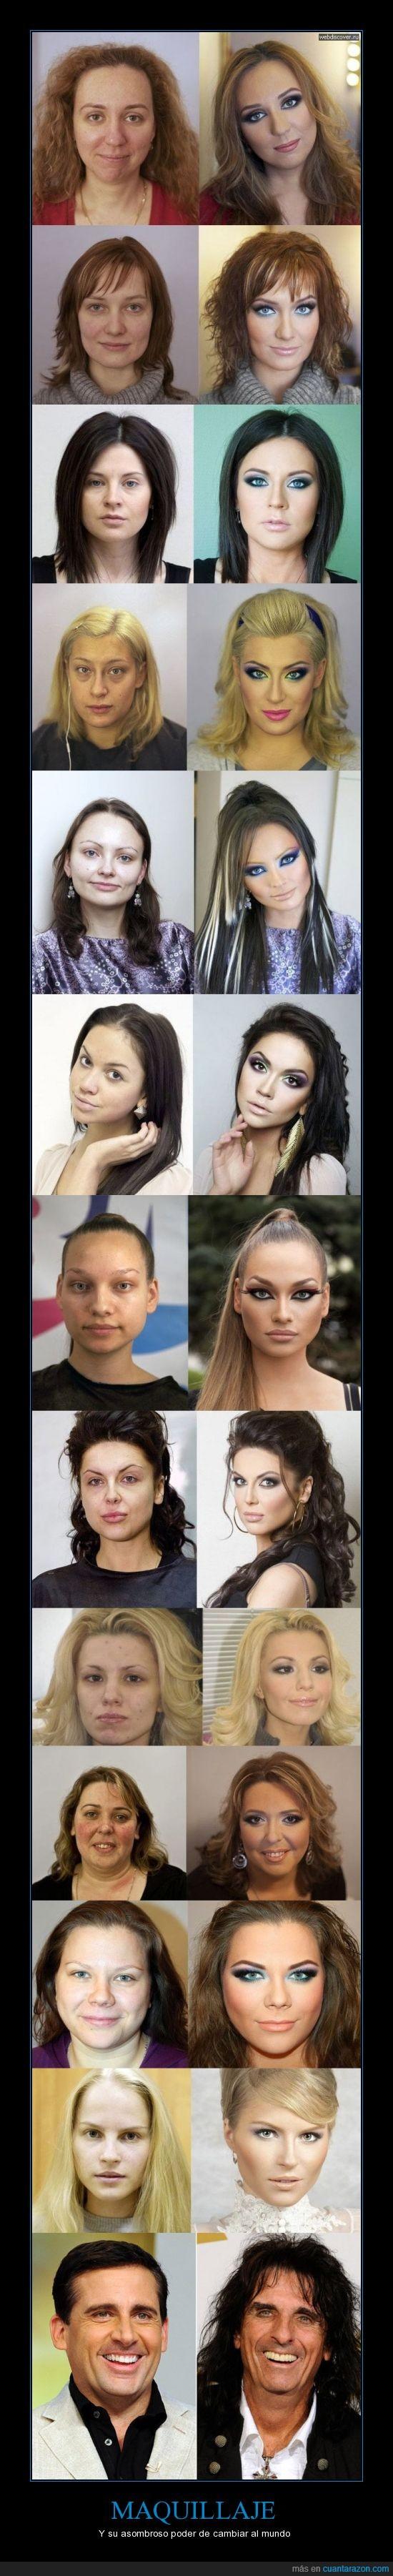 cambio,maquillaje,mejora,mujeres,steve